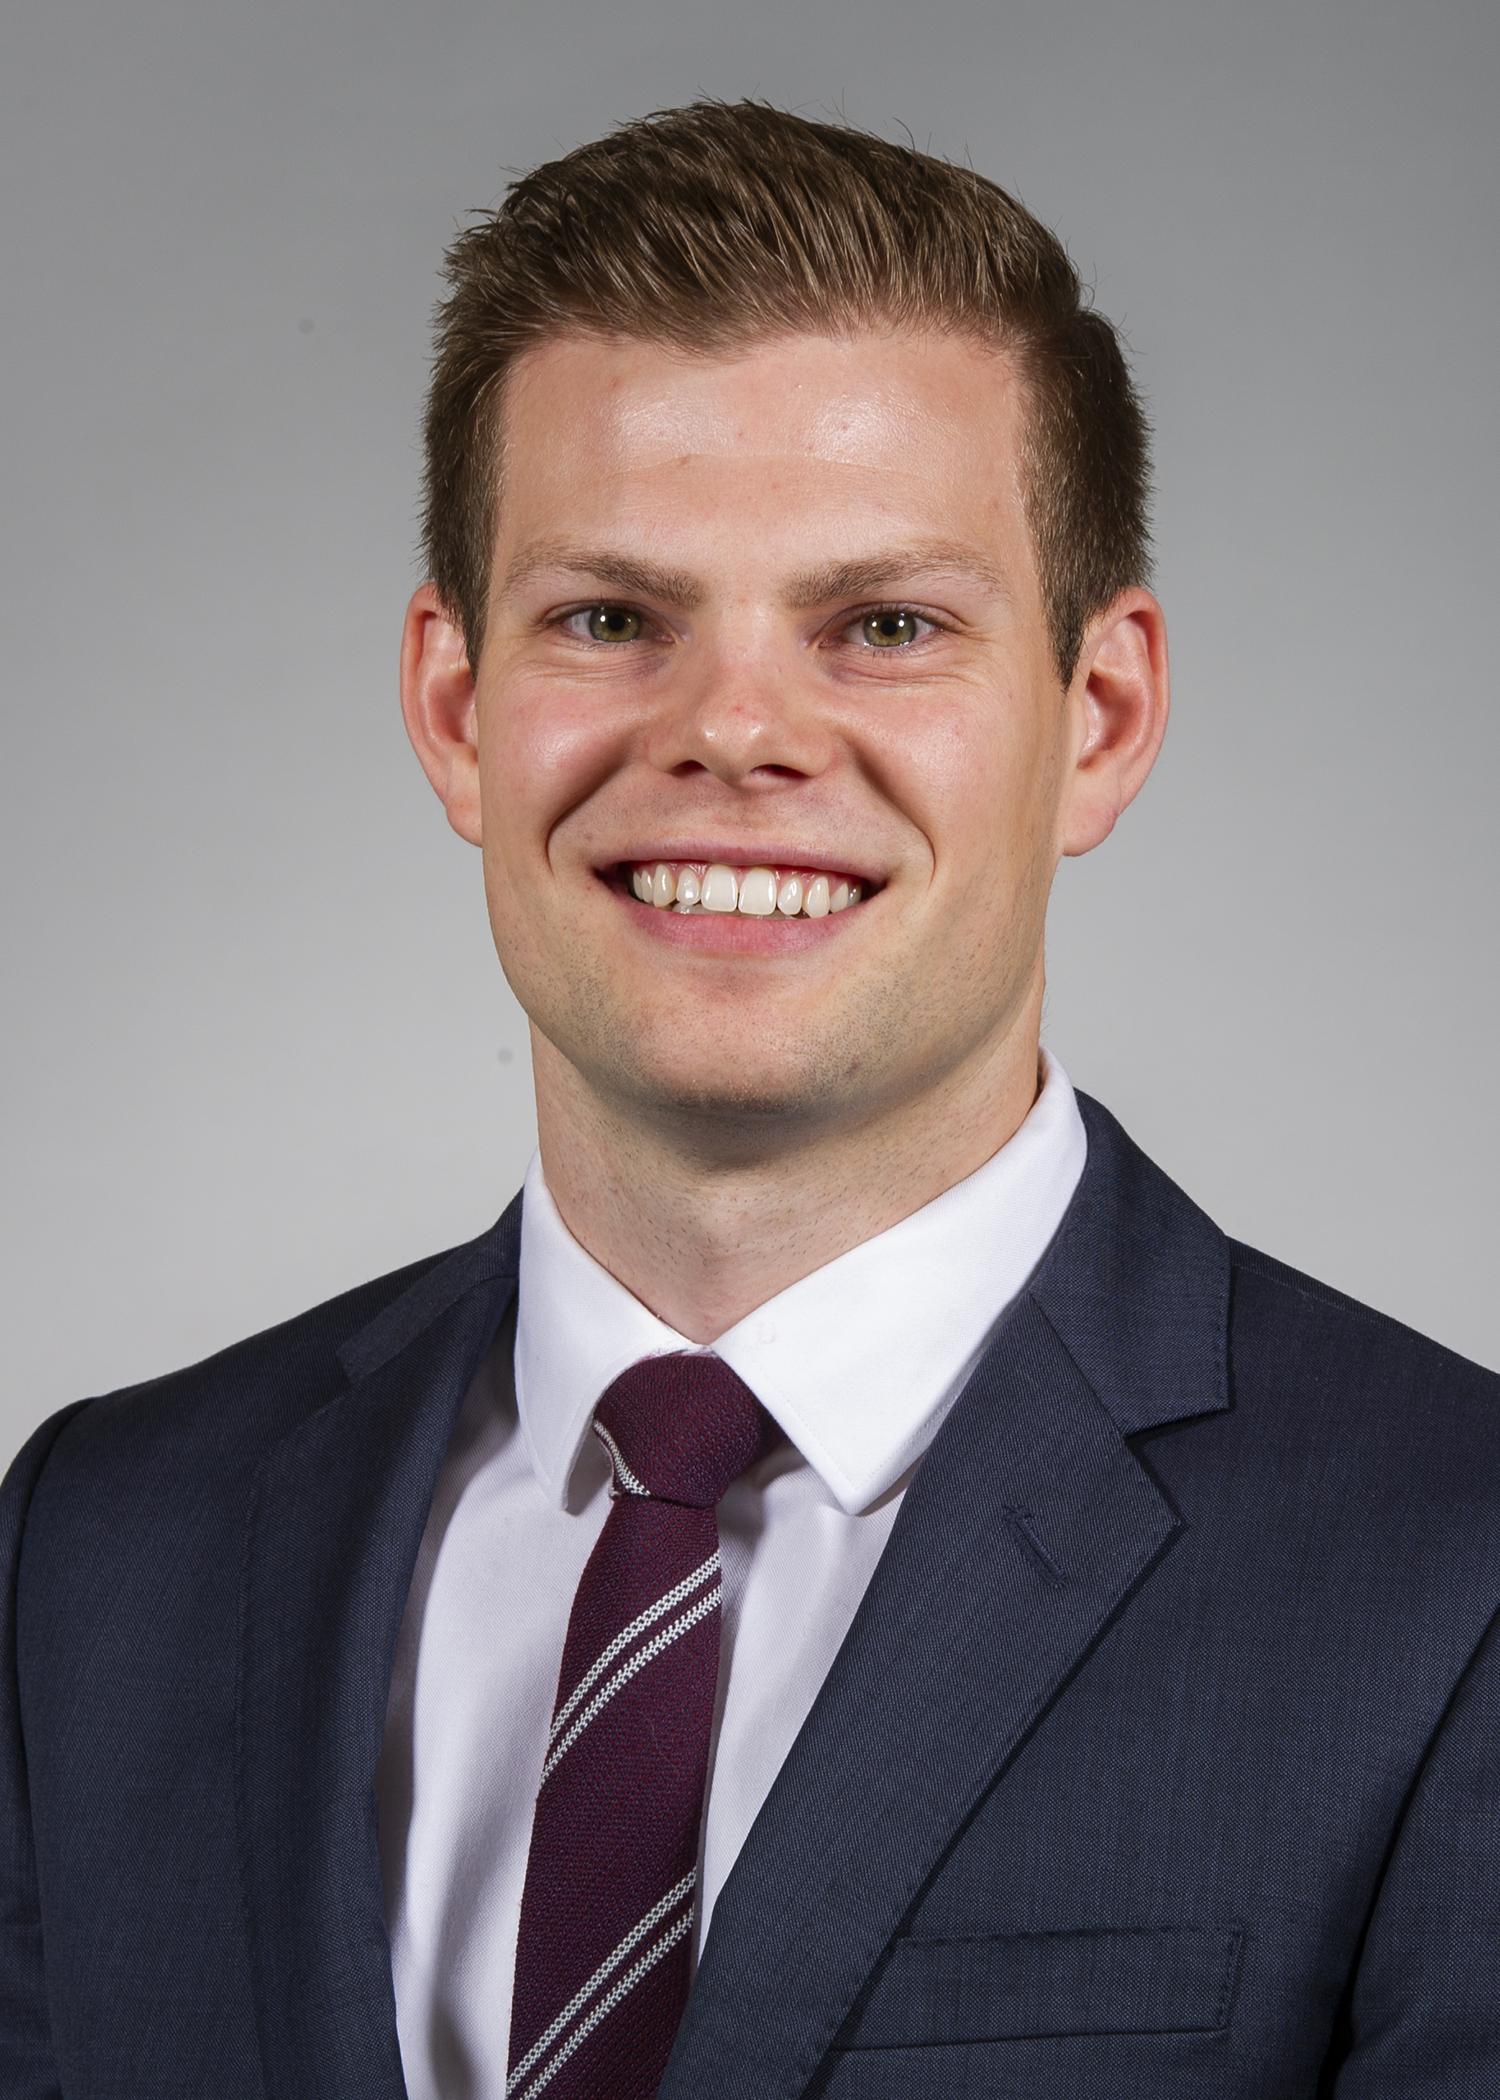 Brendan Hubbard